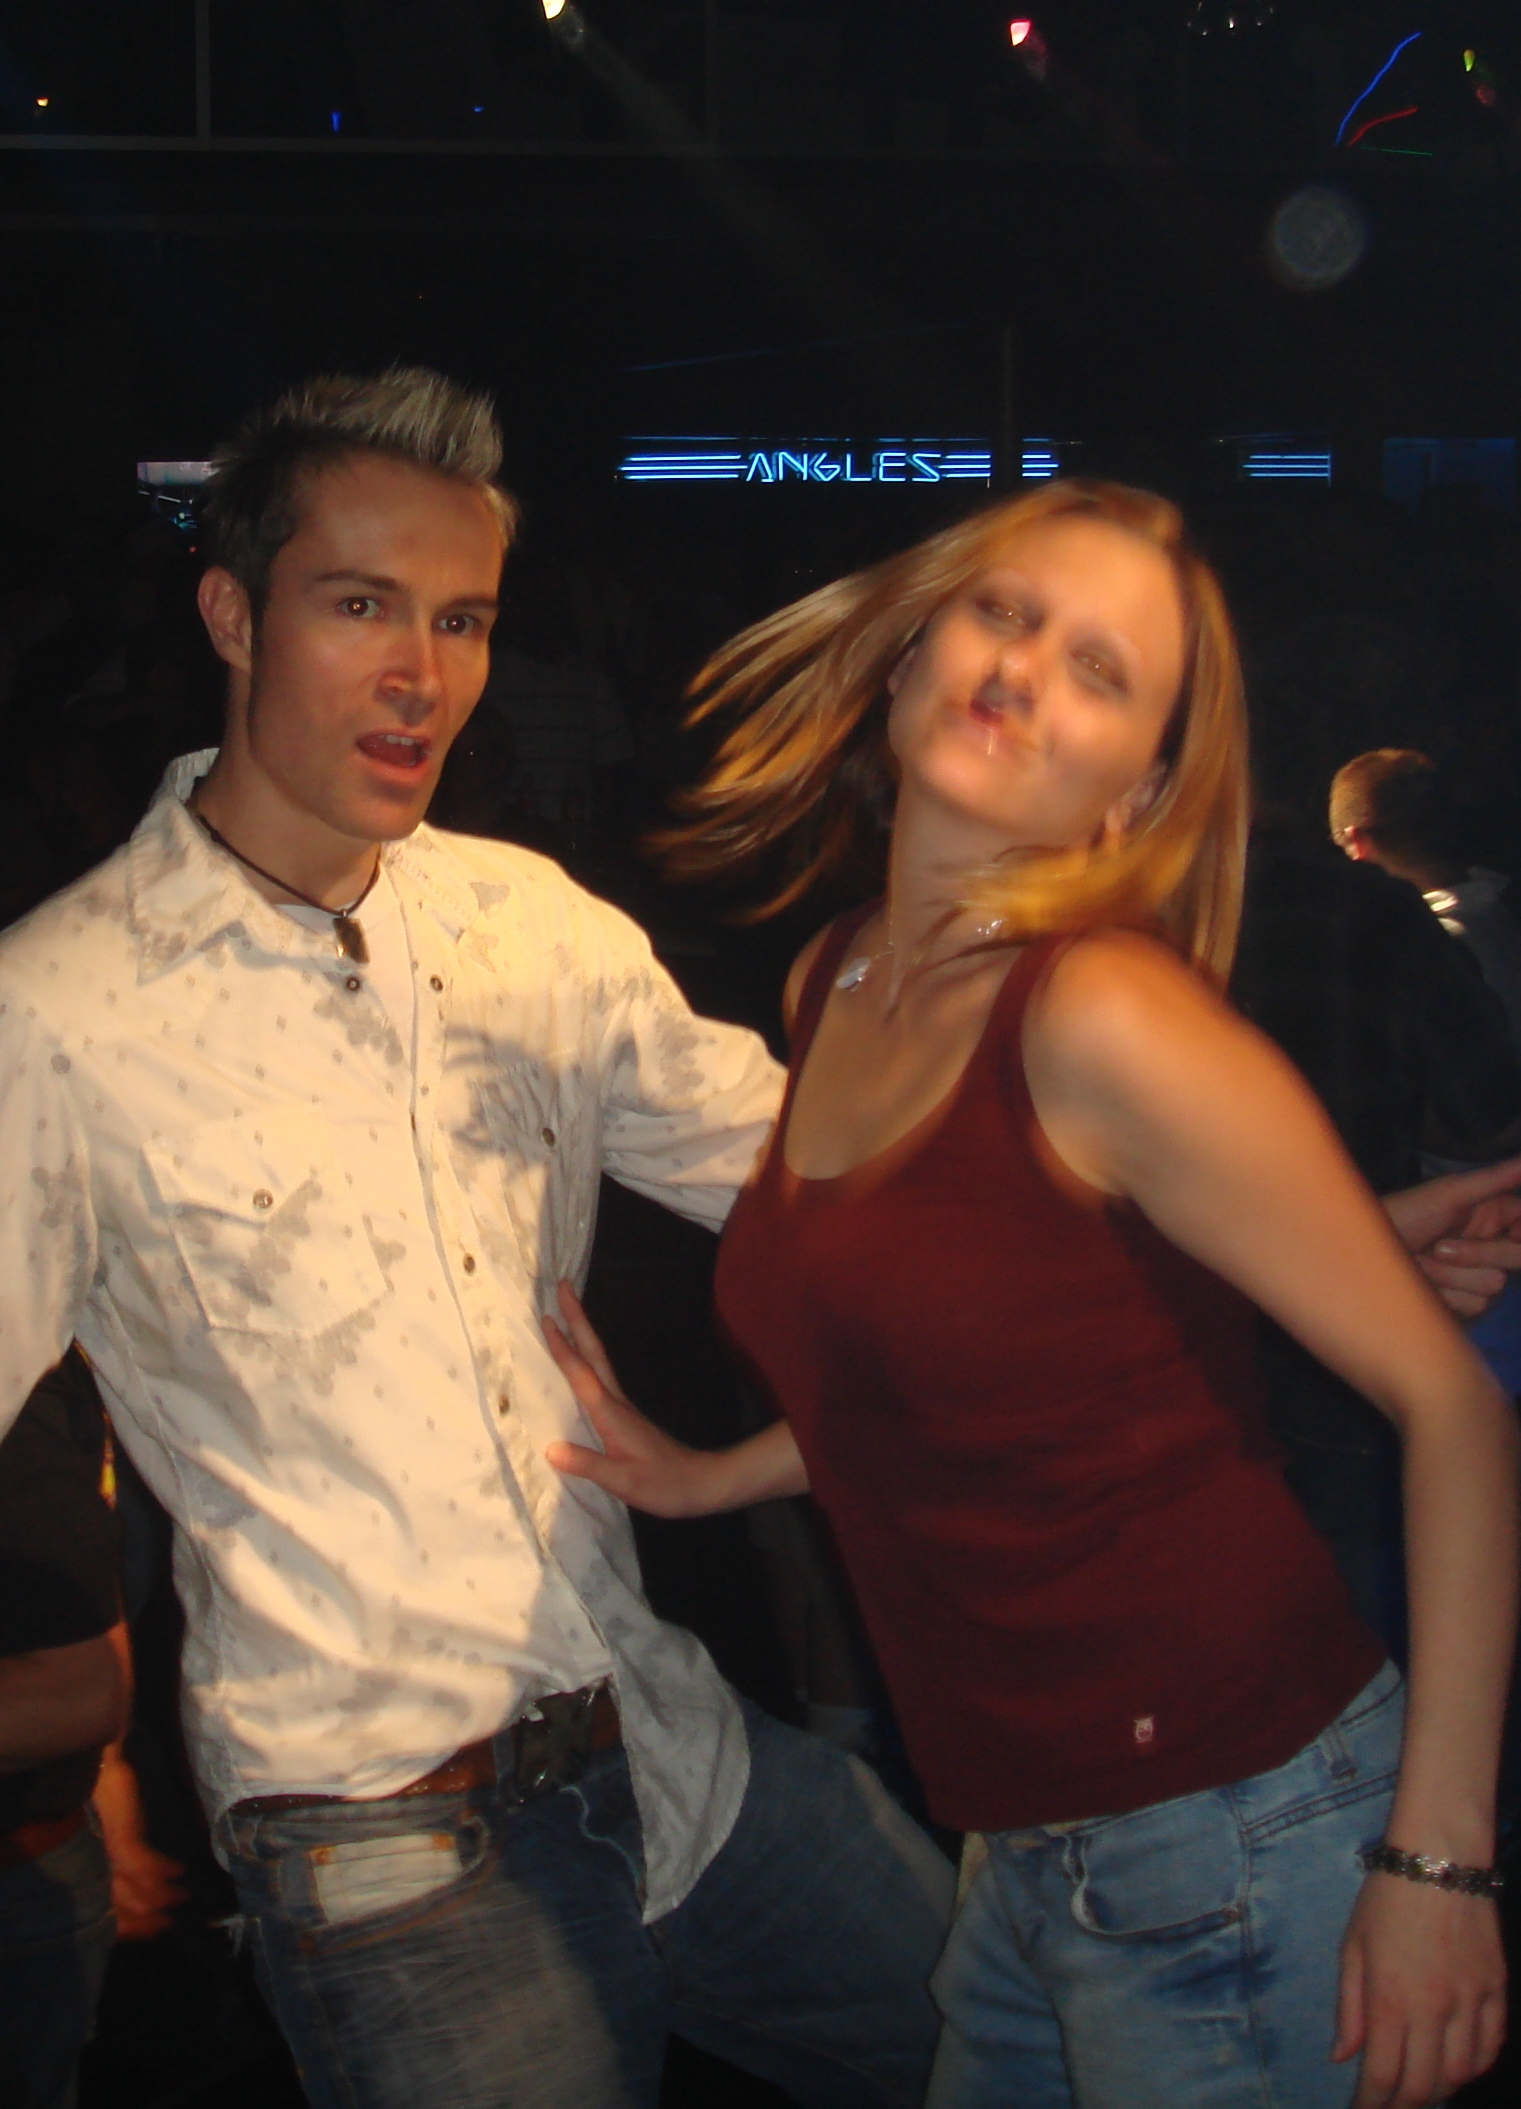 hot girl dancing with boy at gay club